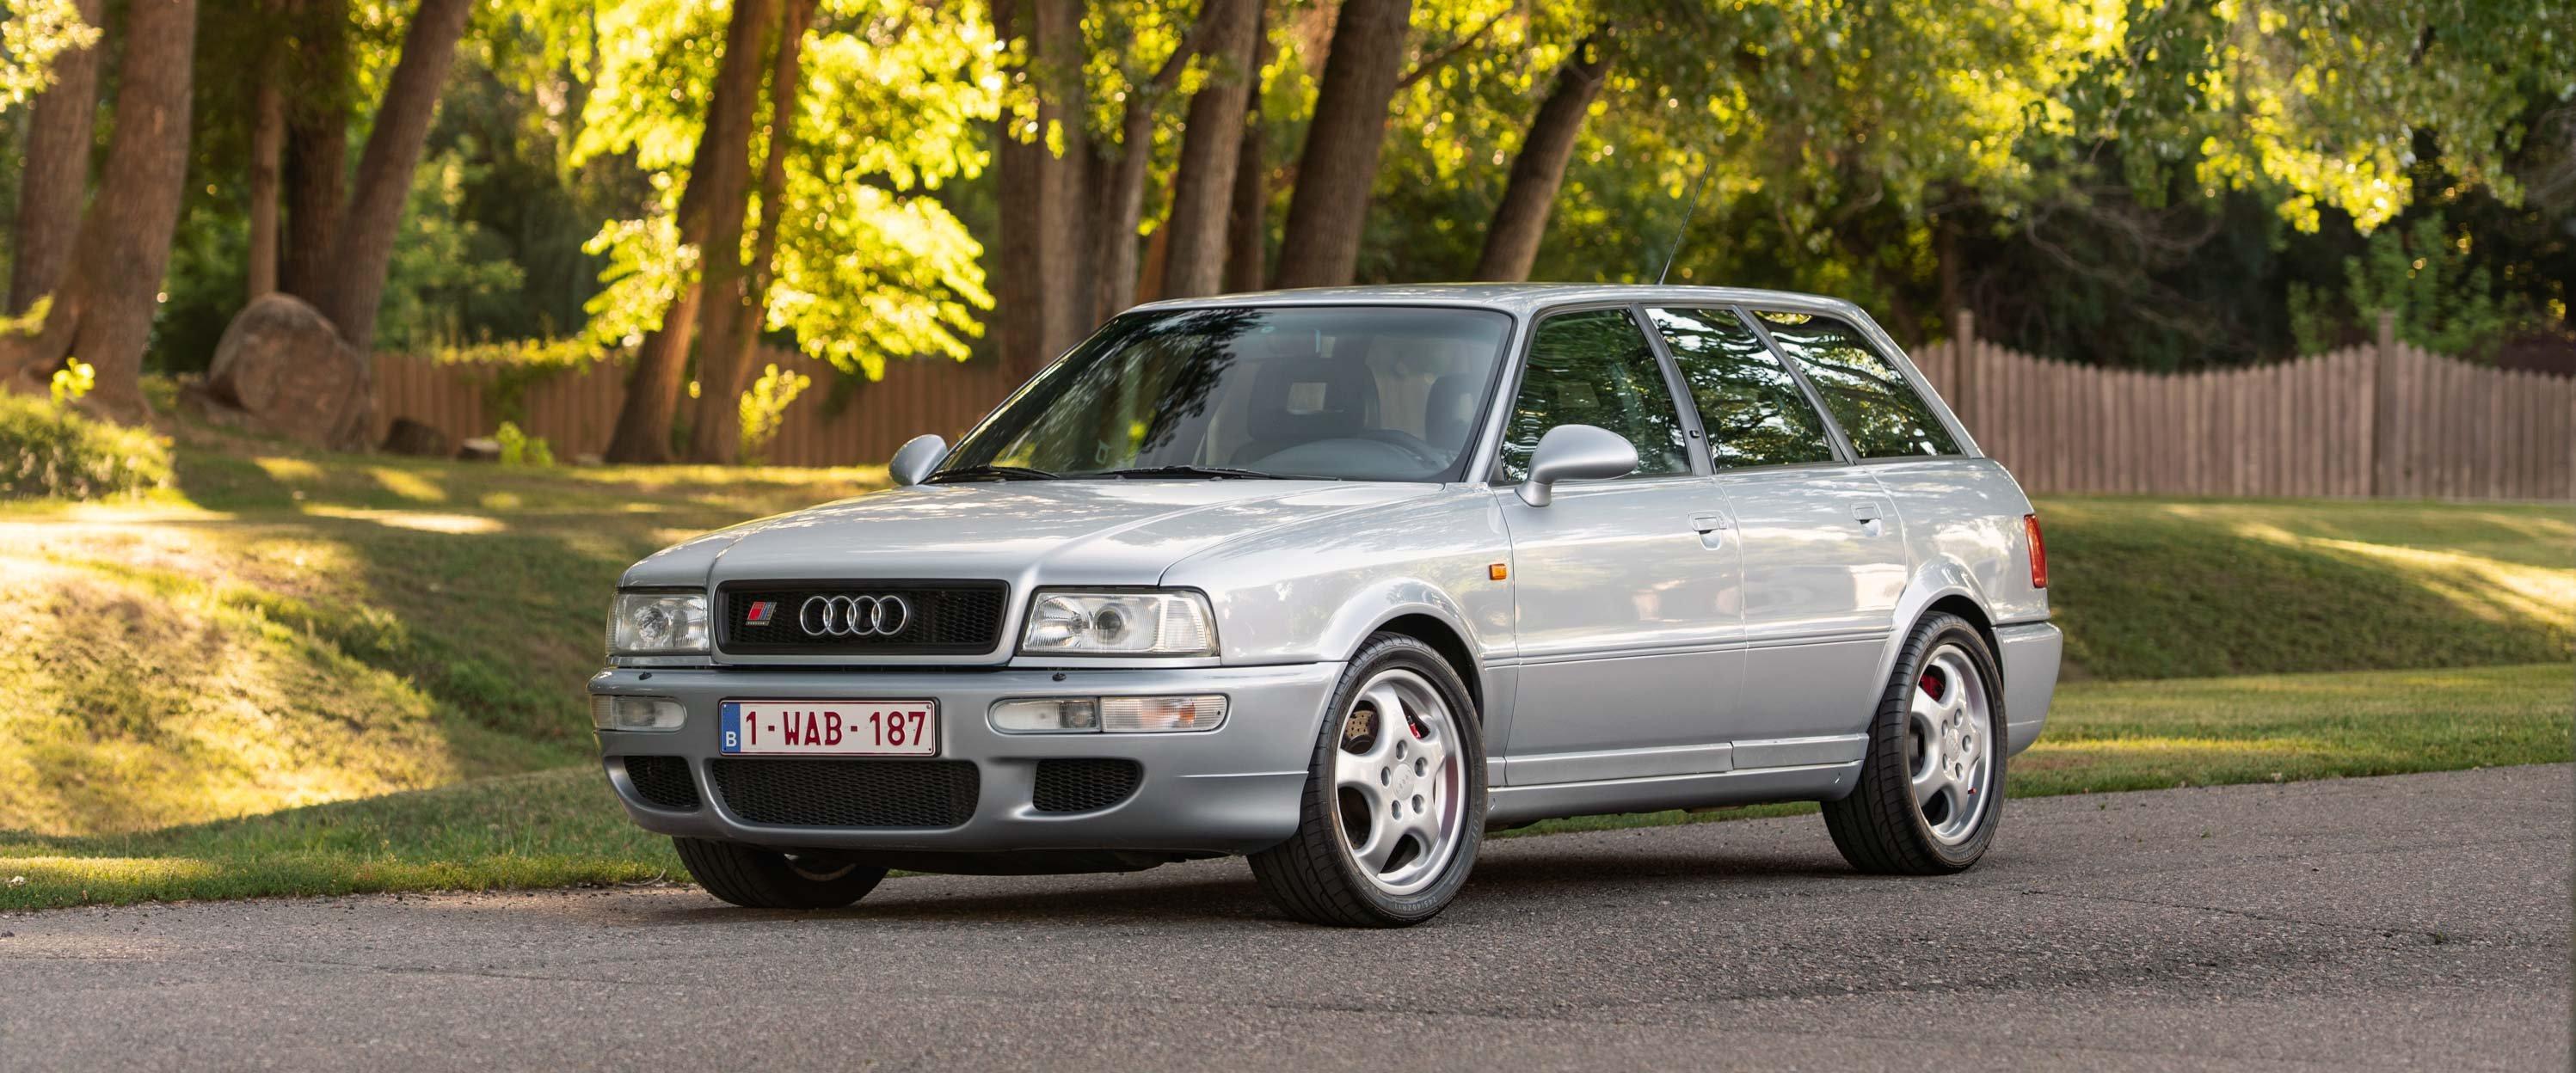 1994-Audi-RS2-Silver-slideshow-003@2x-1